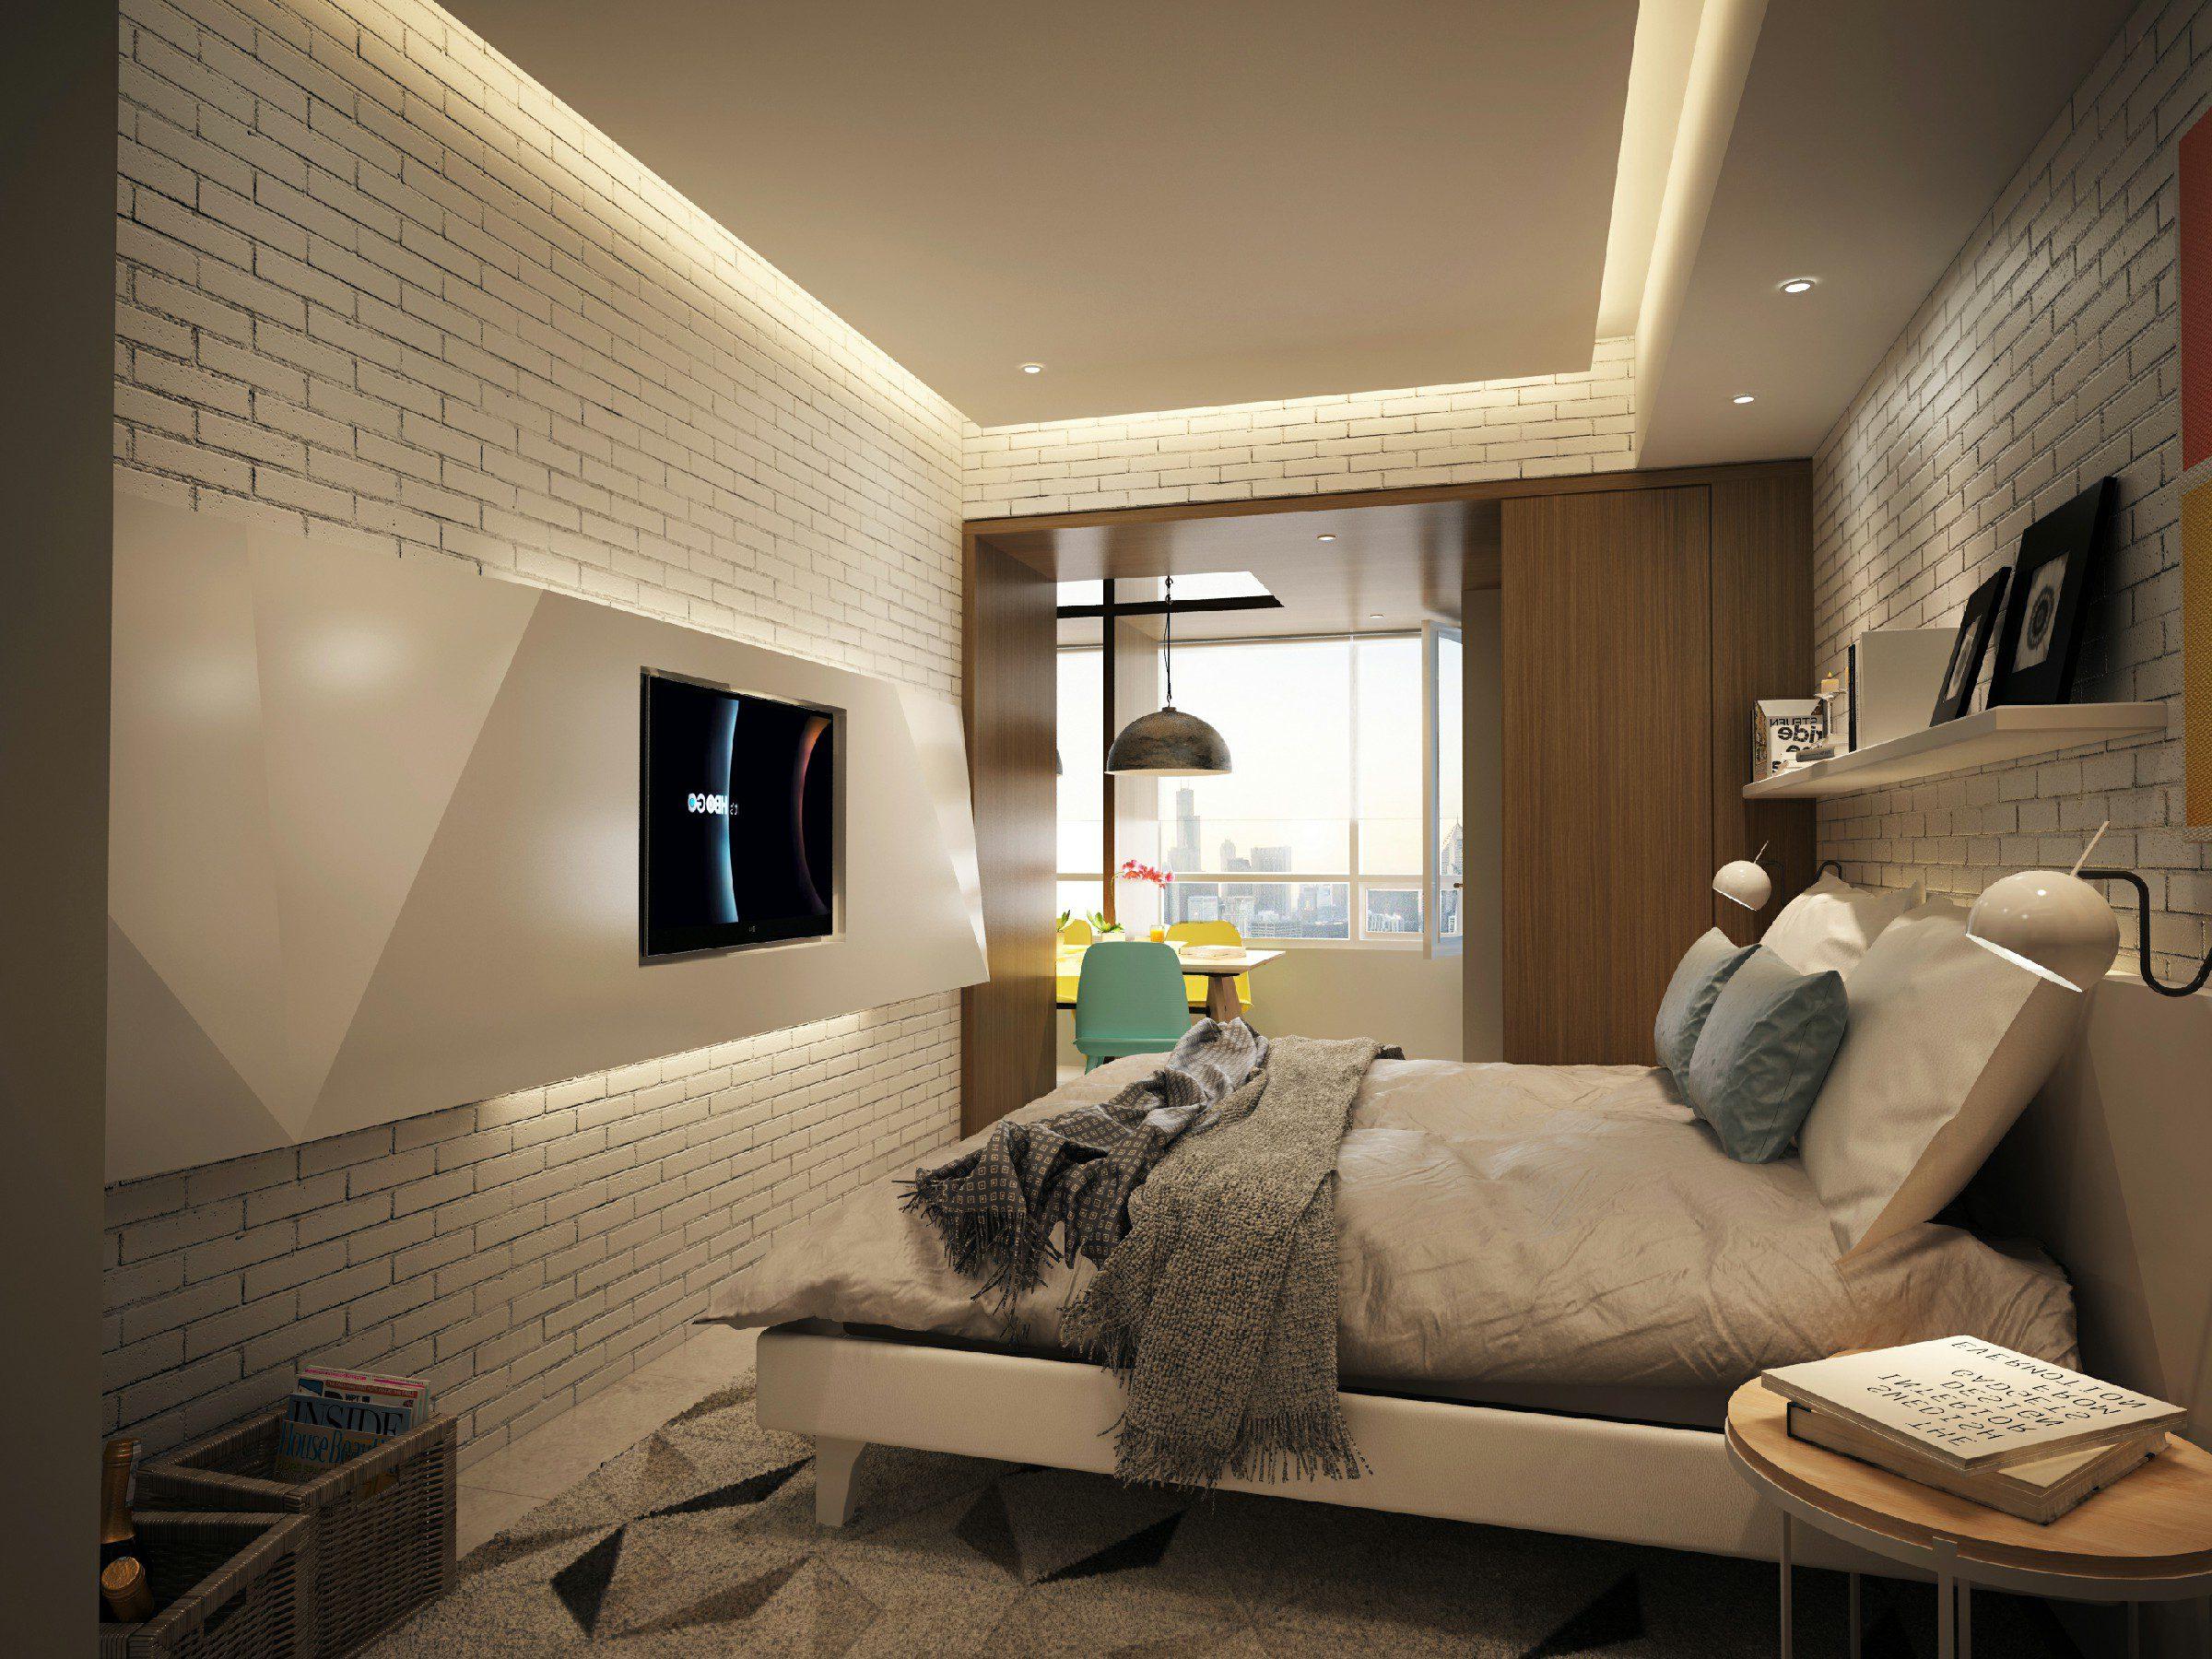 Mengenal Tipe-Tipe Apartemen